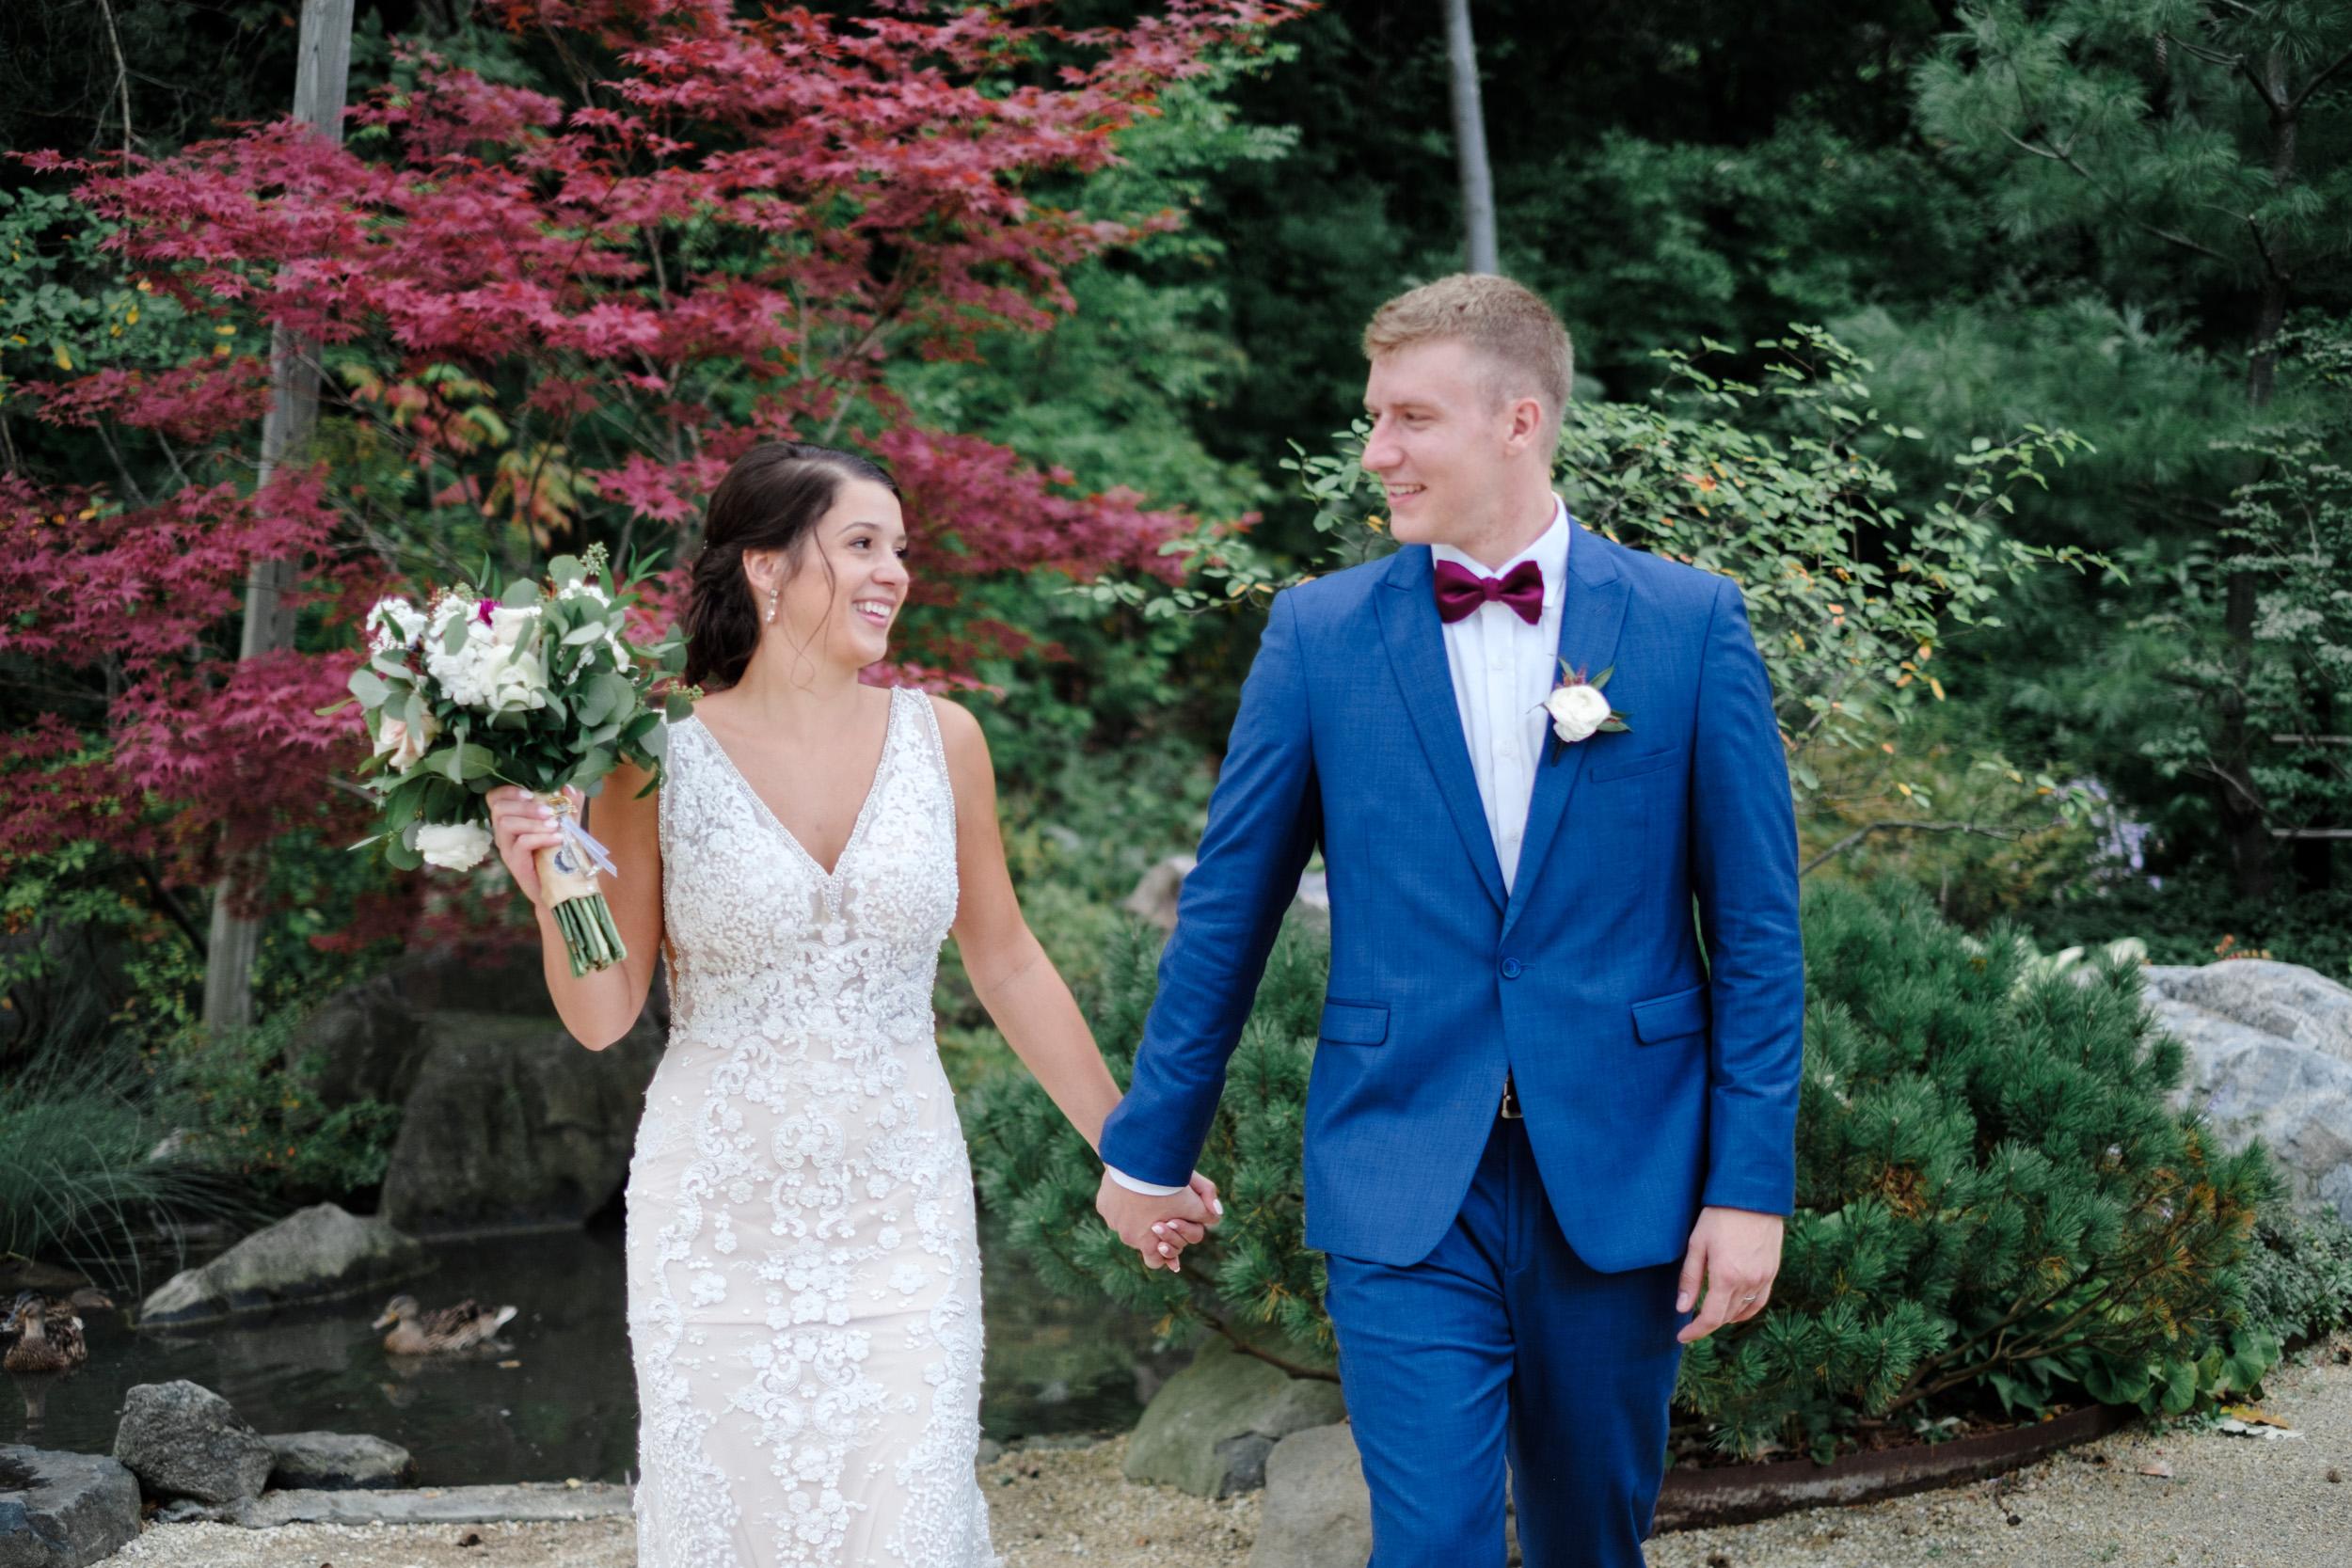 18-09-01 BAP Kiley-Trevor-Anderson-Gardens-Wedding-68.jpg